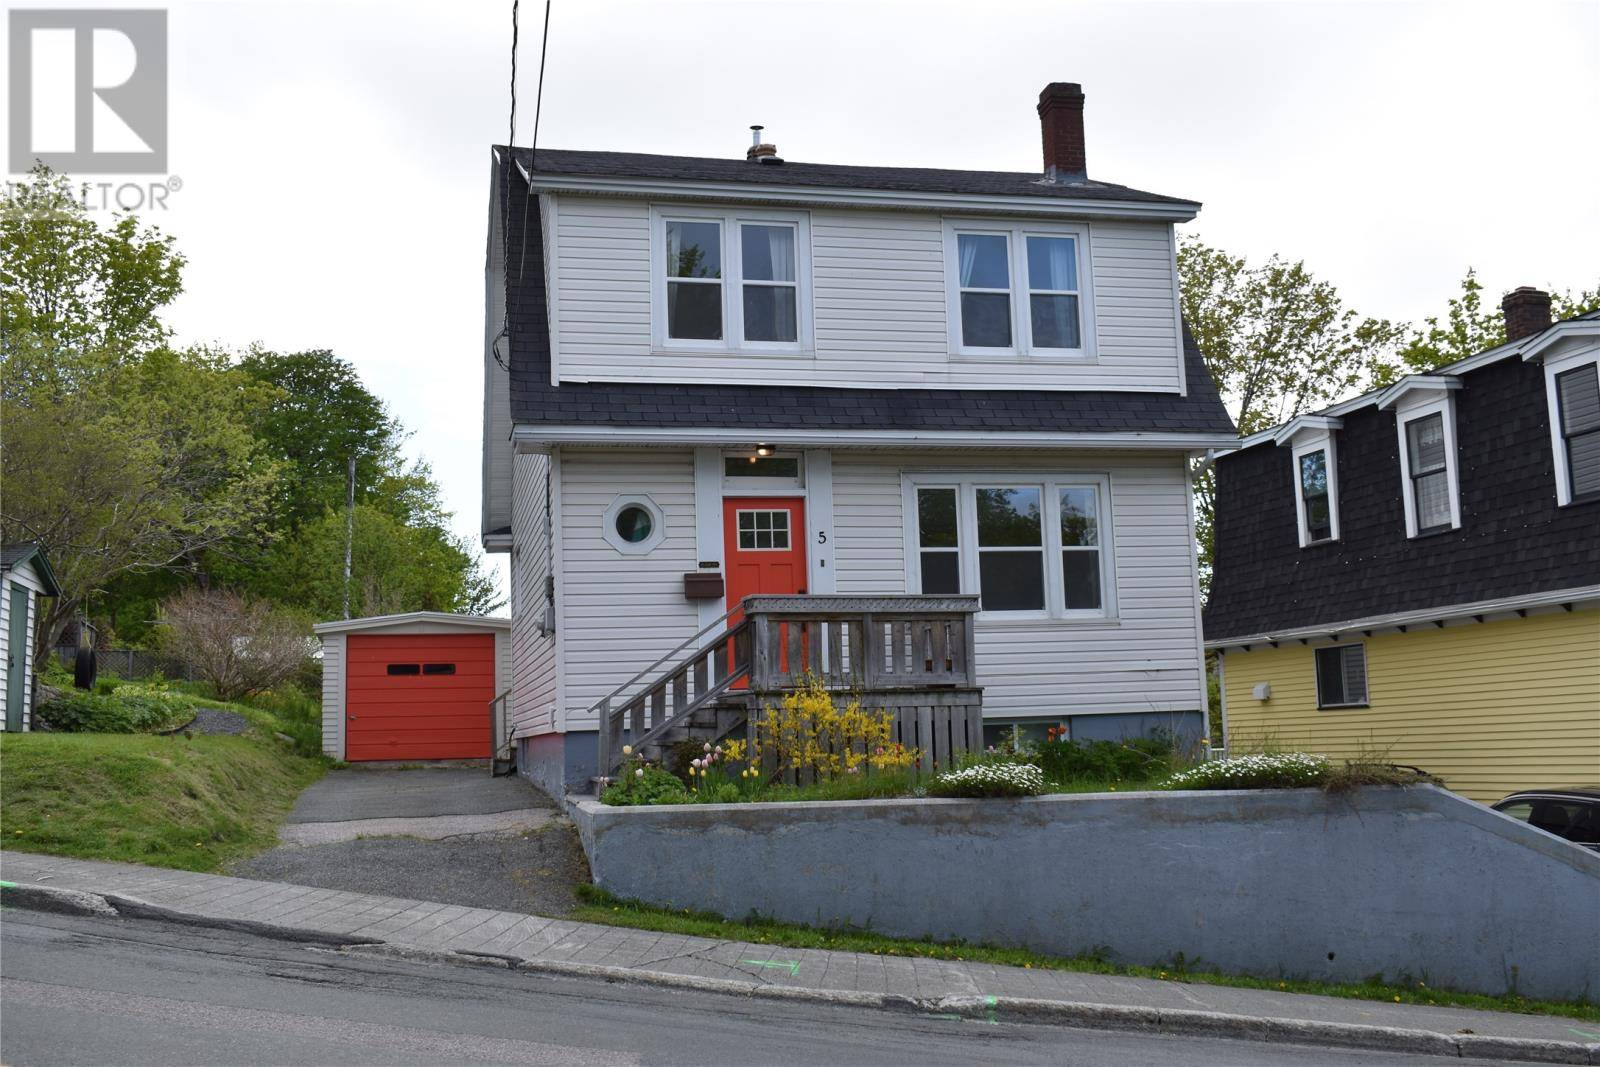 House for sale at 5 Carpasian Rd St. John's Newfoundland - MLS: 1197952